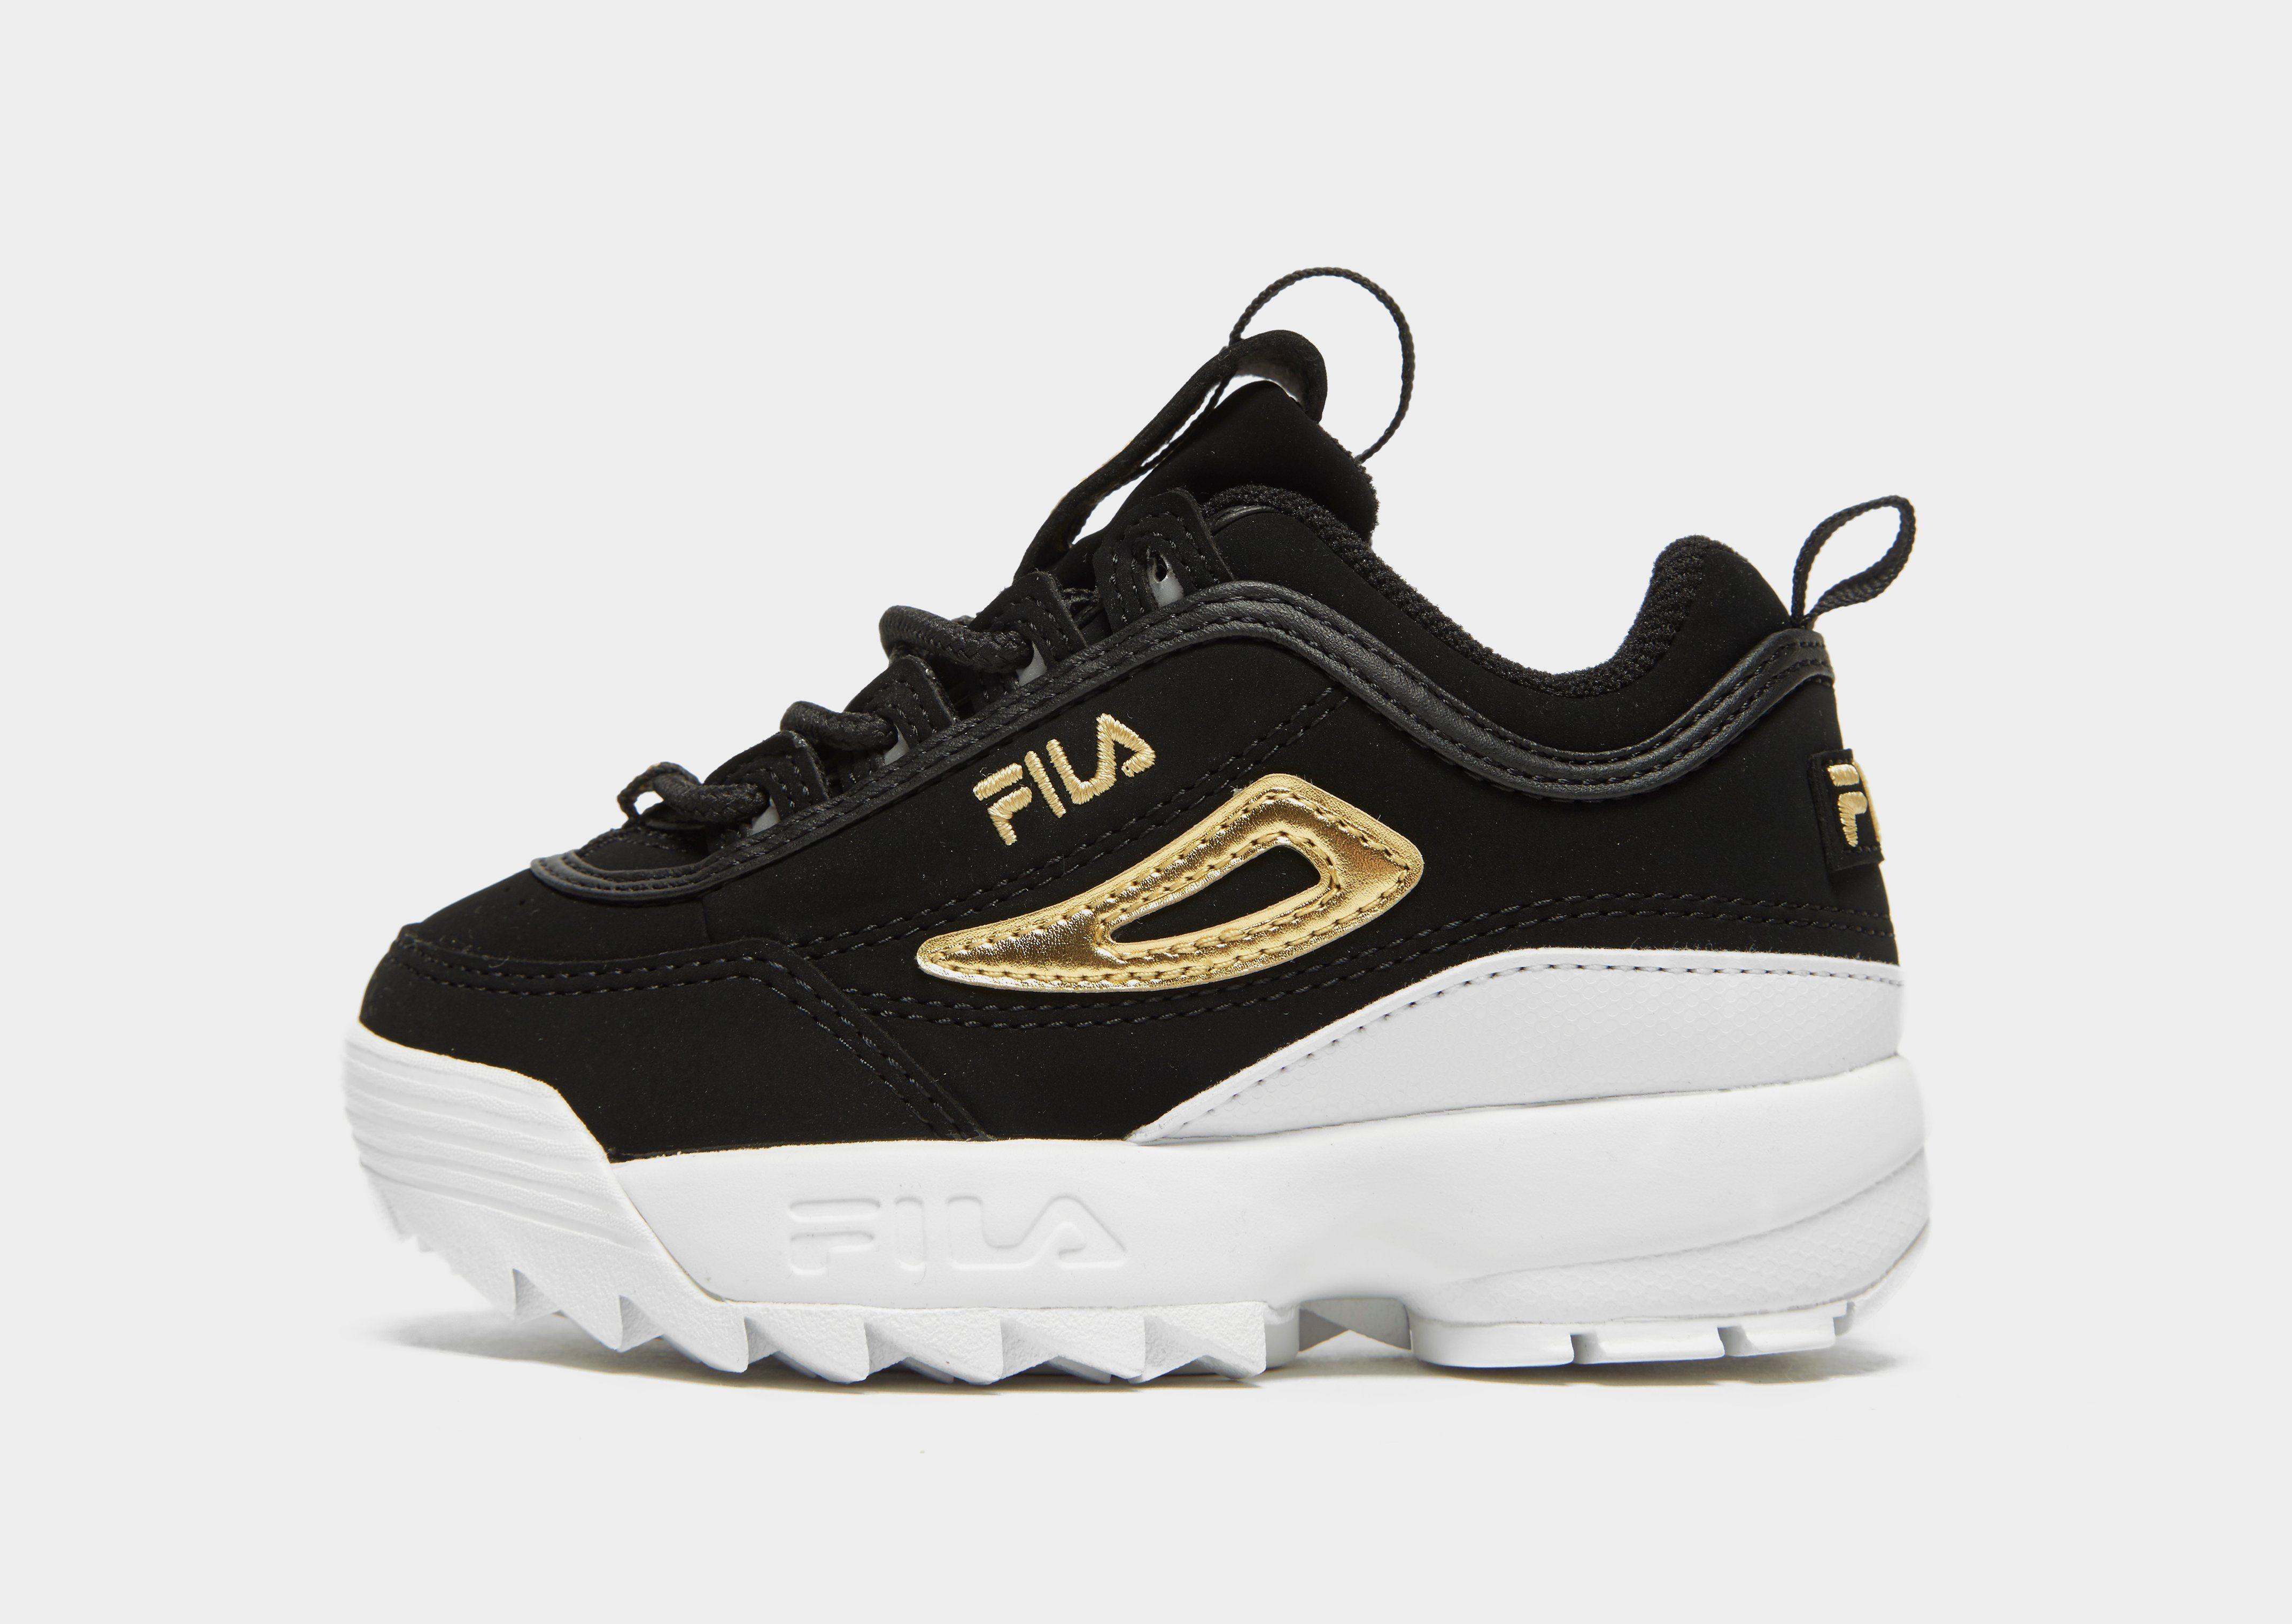 chaussure fila jd blanche doré